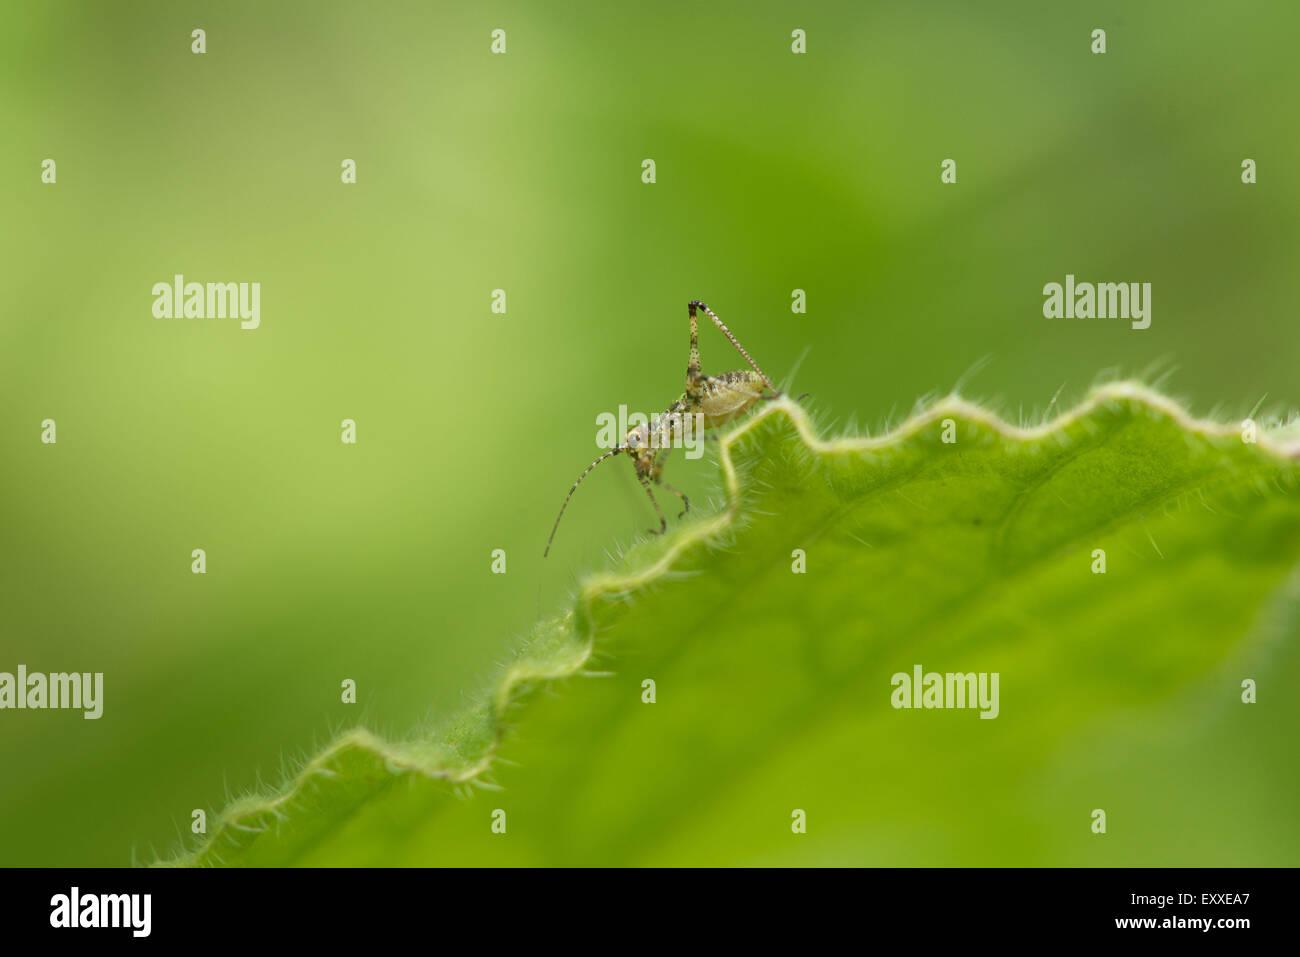 Close-up of cricket sur leaf Banque D'Images